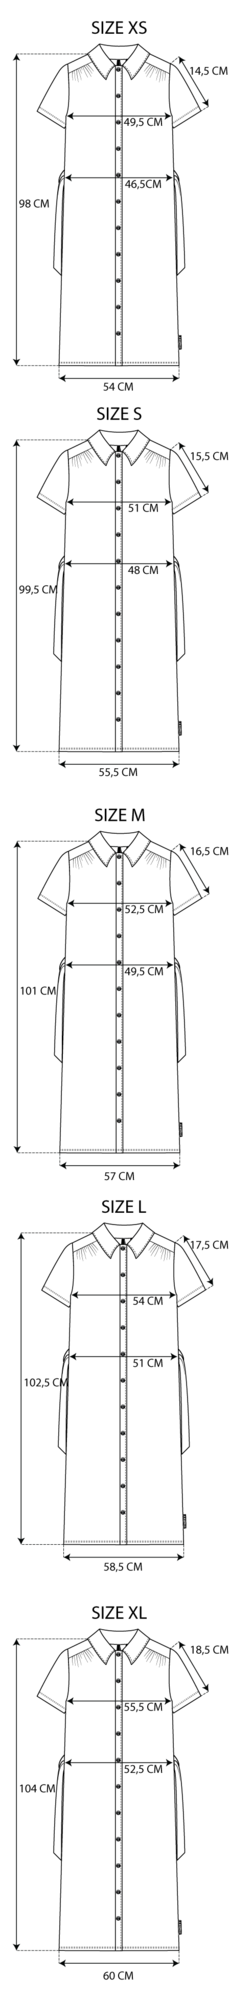 Maattabel La Shirt Dress